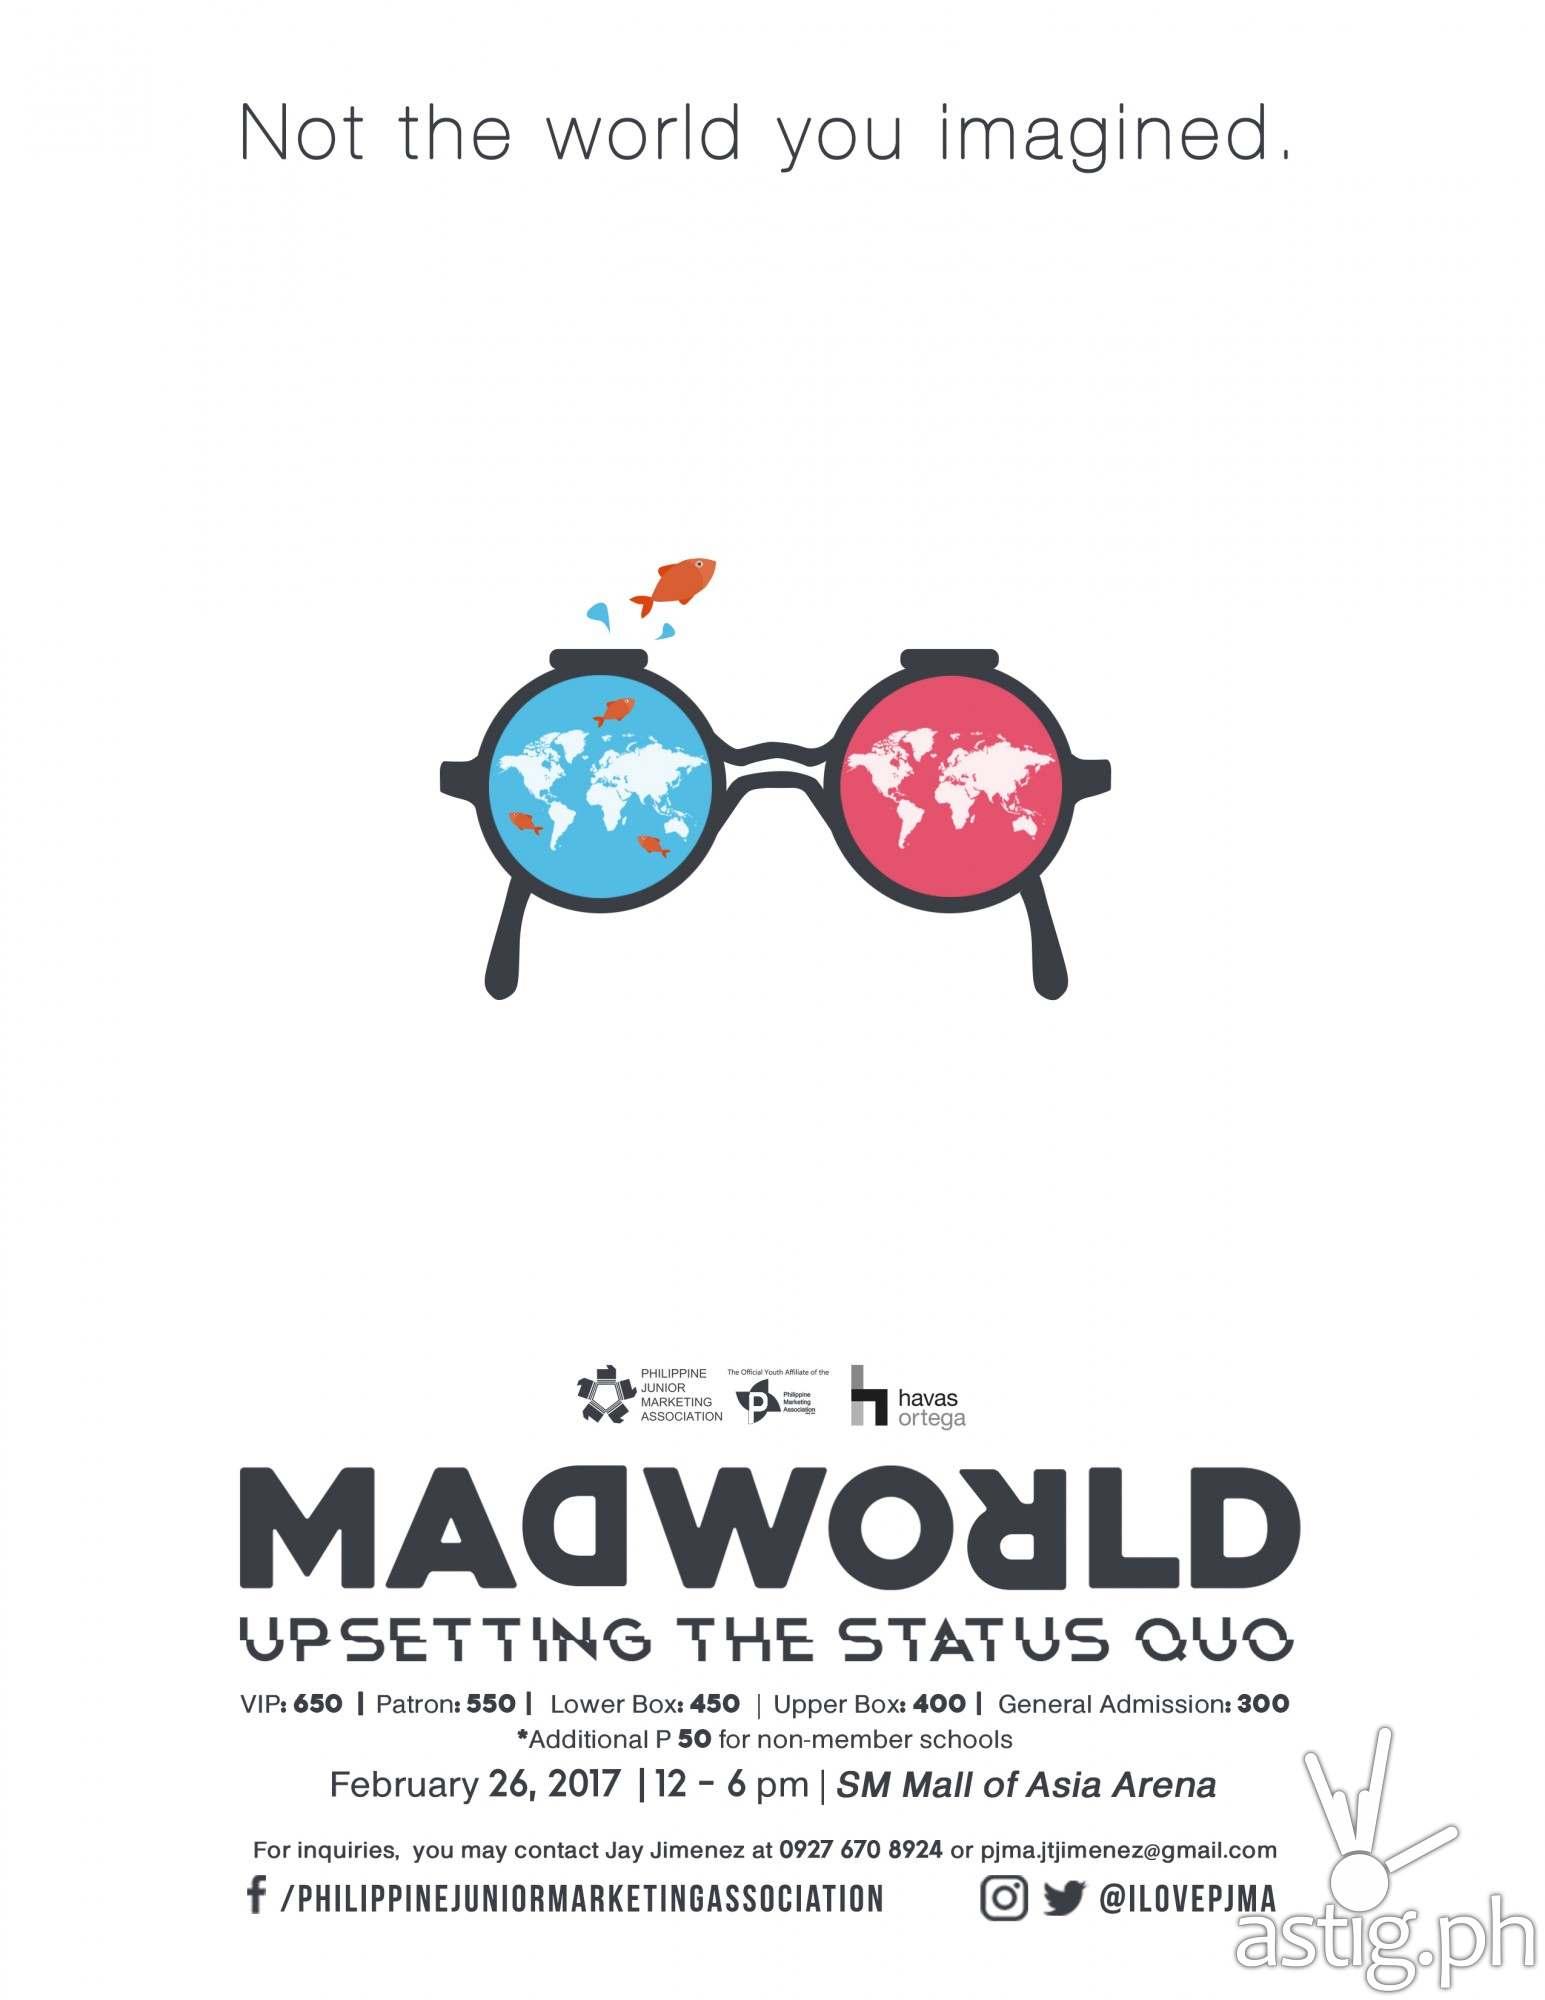 Madworld 2017 poster